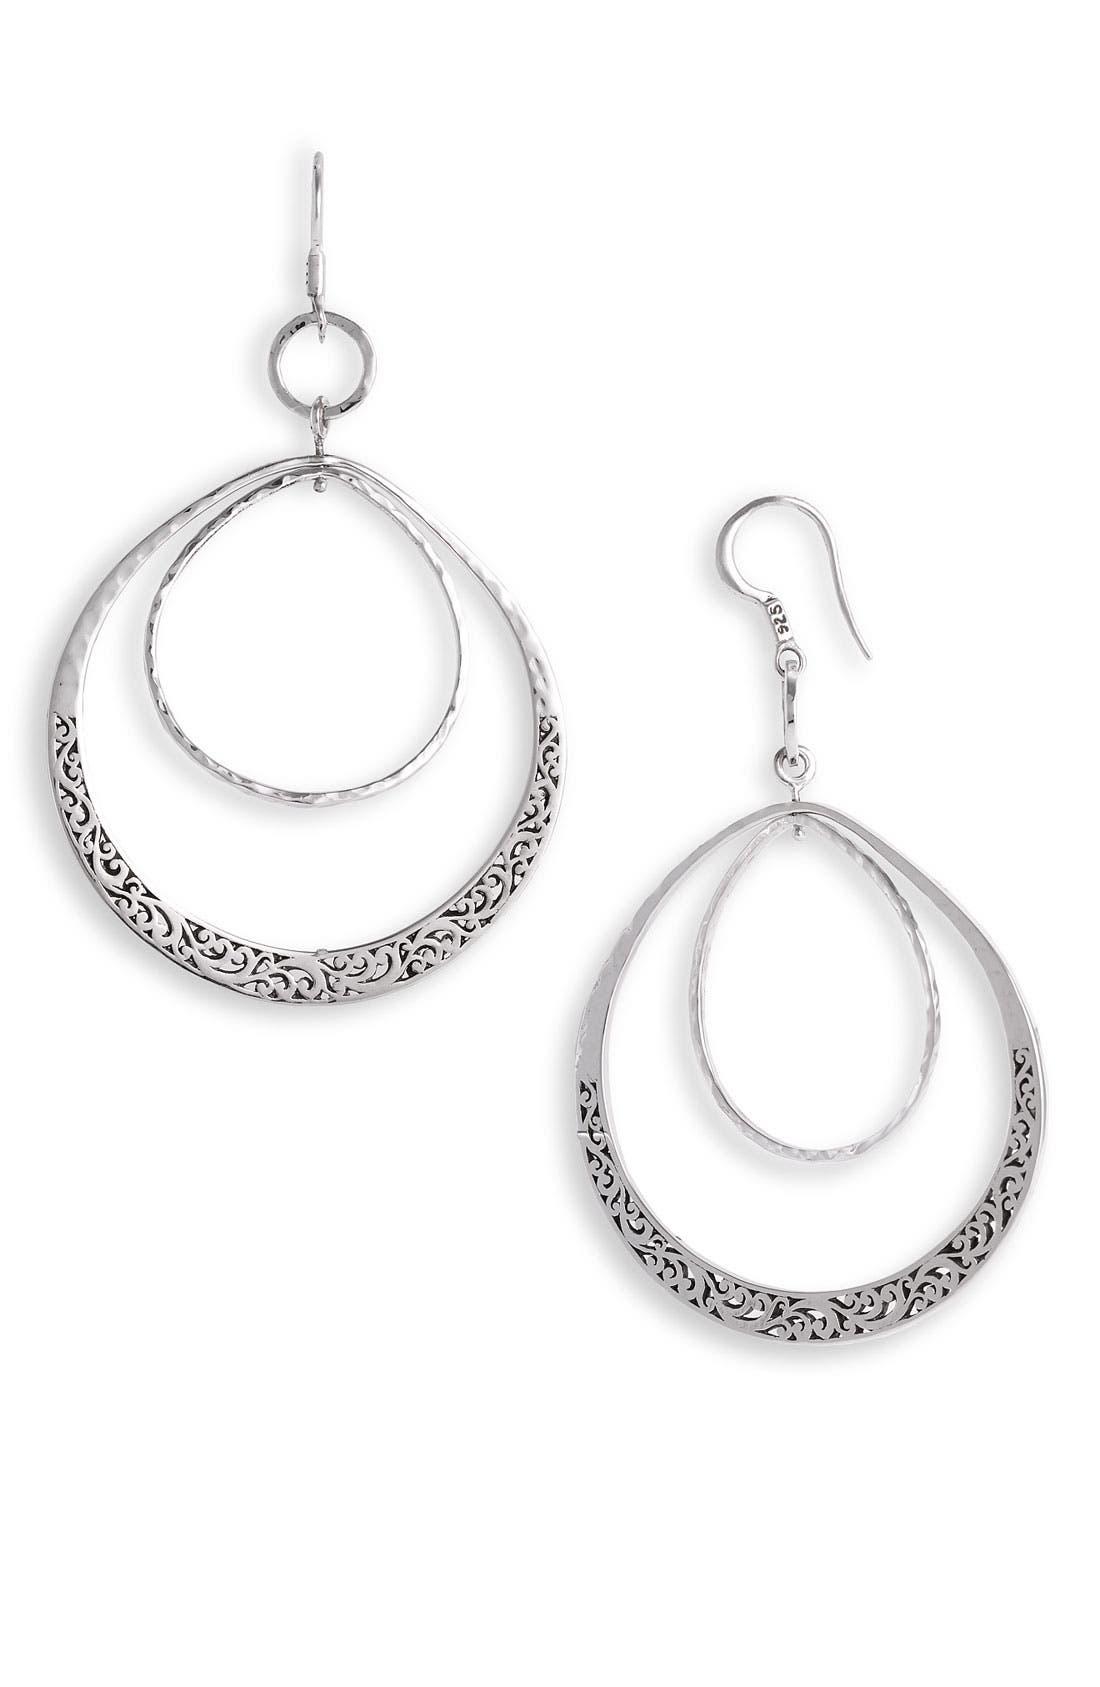 Alternate Image 1 Selected - Lois Hill 'Classics' Large Orbiting Teardrop Earrings